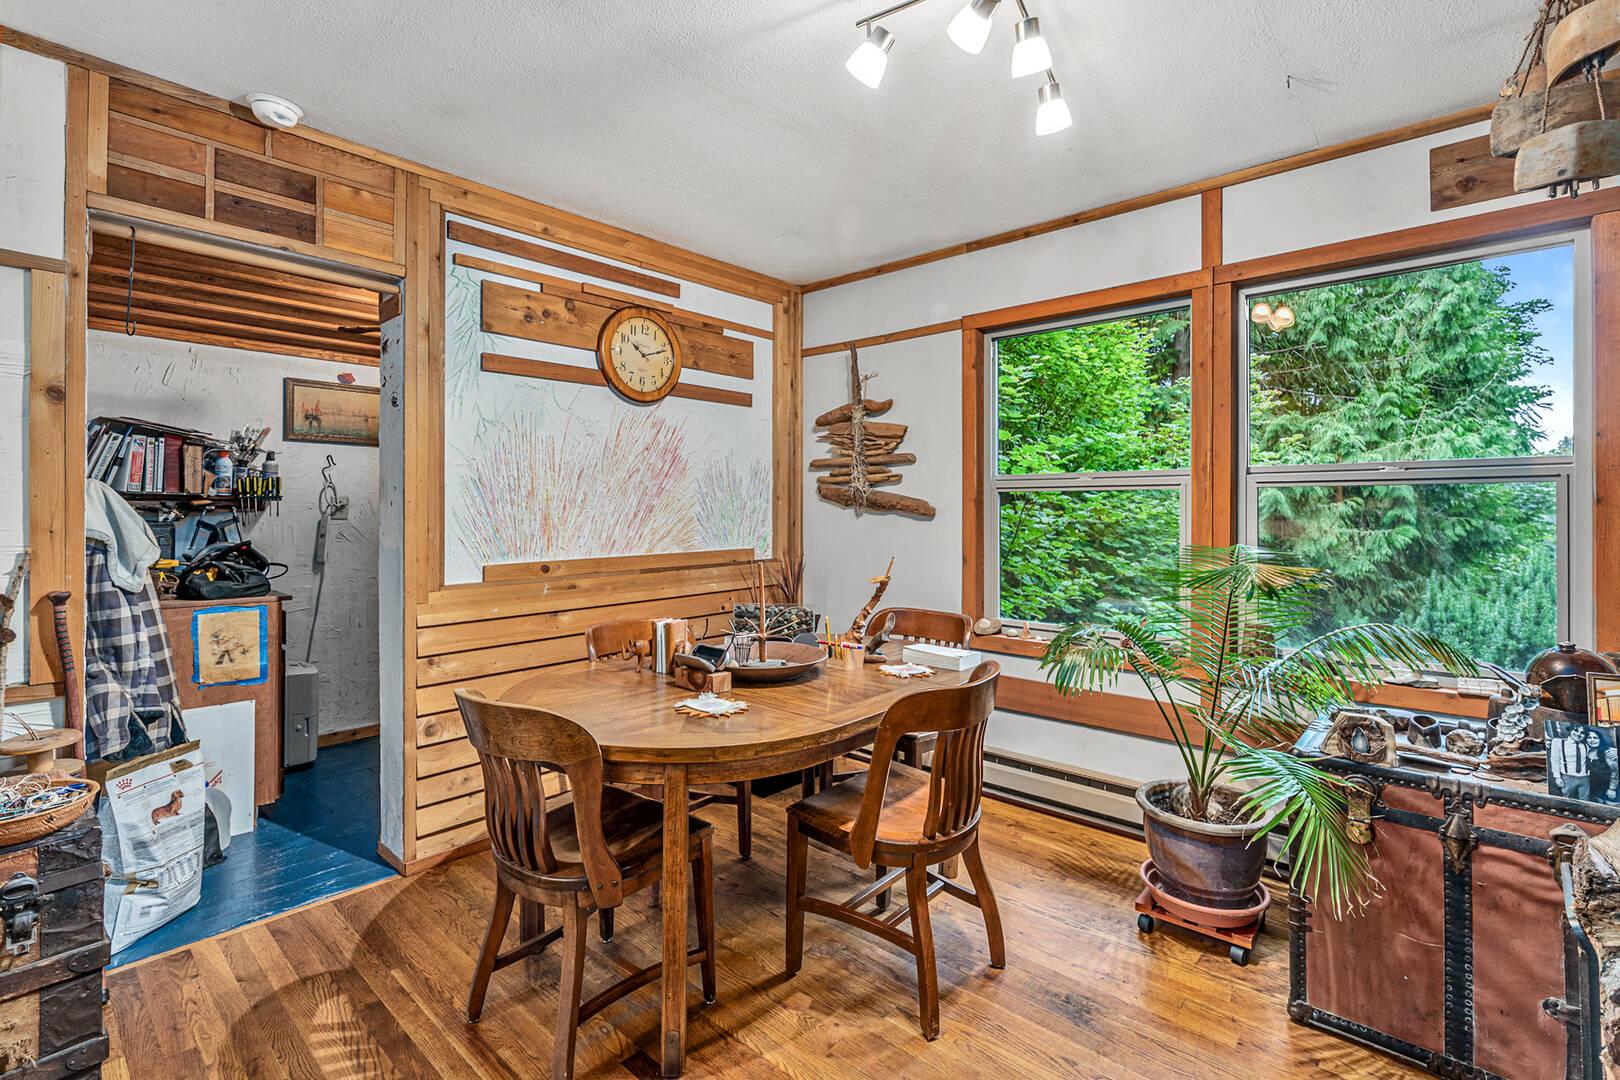 6417 Adams Log Cabin Rd Snohomish, WA 98290